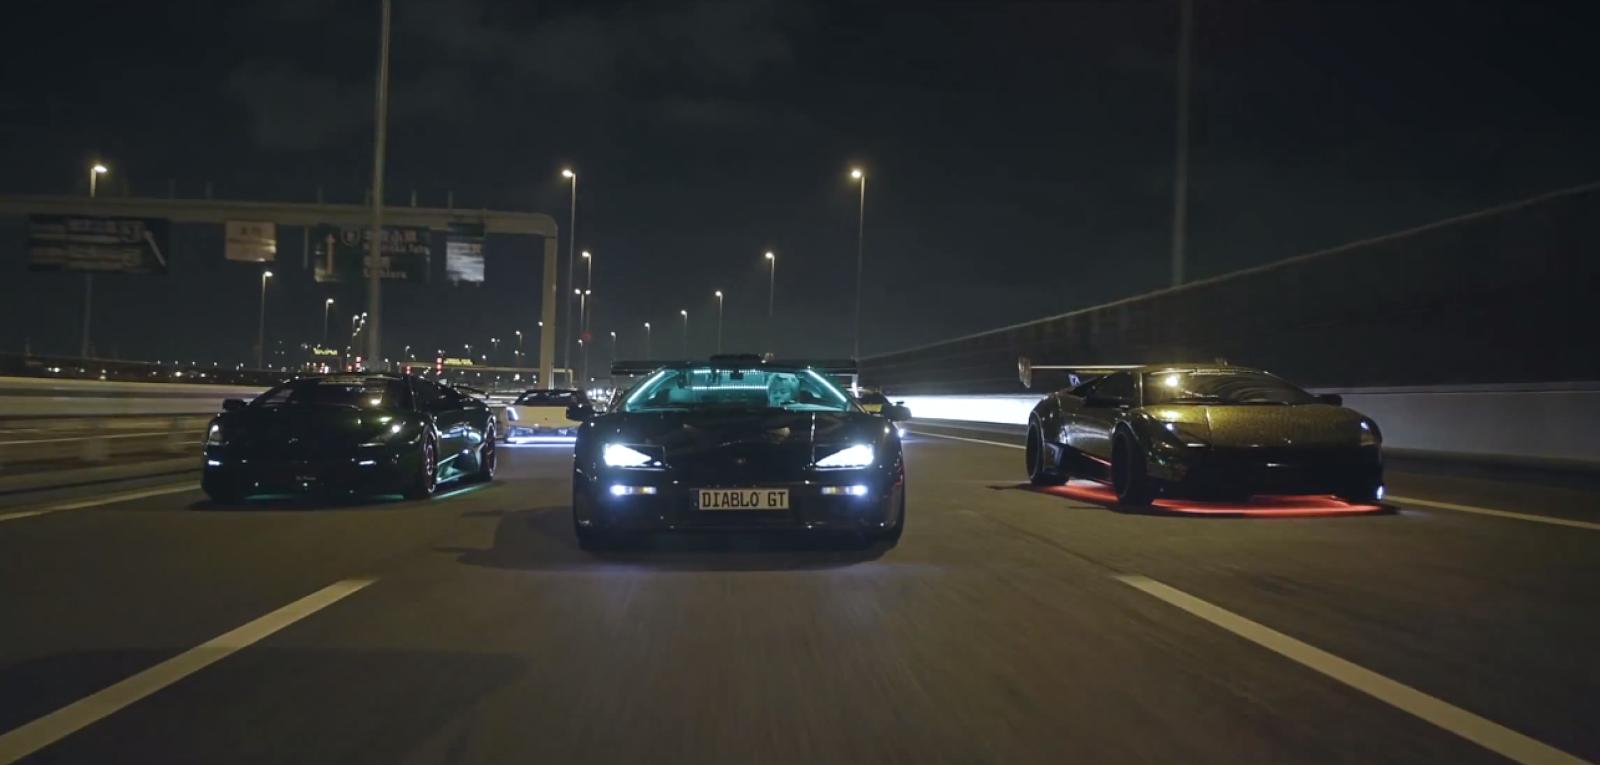 okokno : Lamborghini's of Japan's Yakuza underworld ...